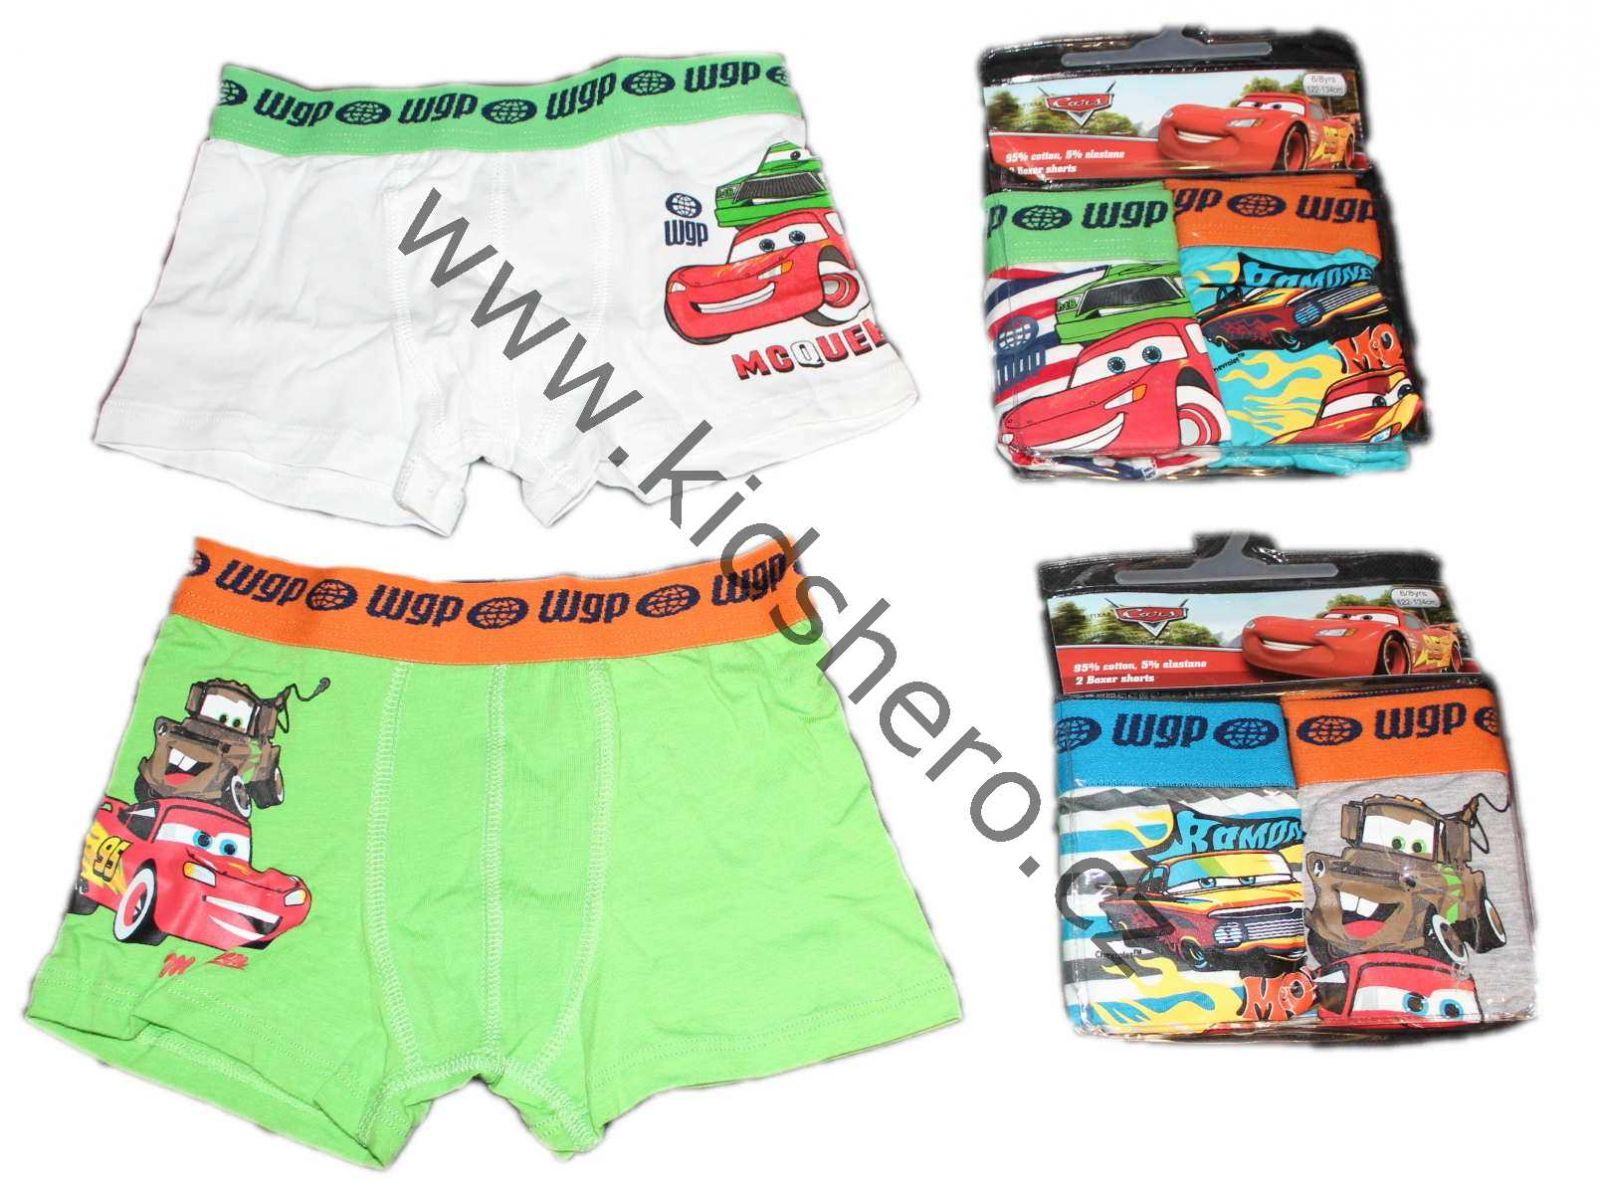 chlapecké boxerky s auty, boxerky cars, trenky cars, trenkoslipy Disney